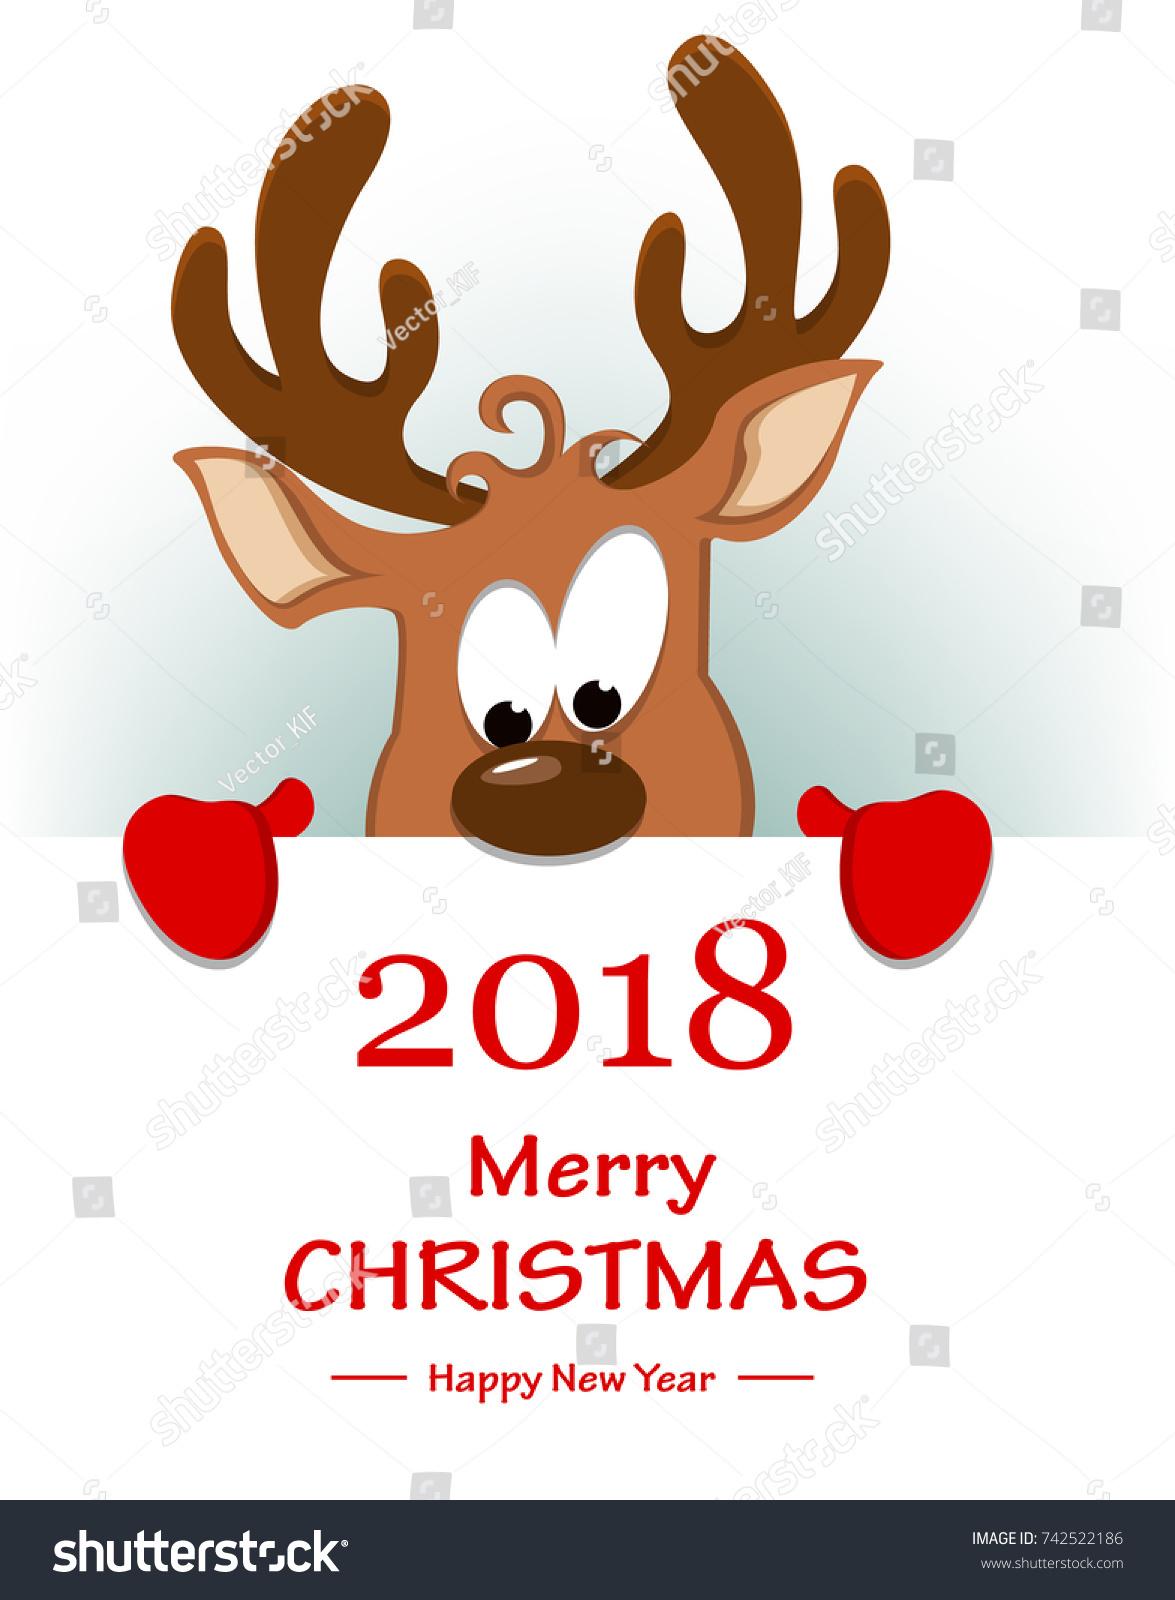 Merry christmas greeting card funny reindeer stock vector 742522186 merry christmas greeting card funny reindeer stock vector 742522186 shutterstock m4hsunfo